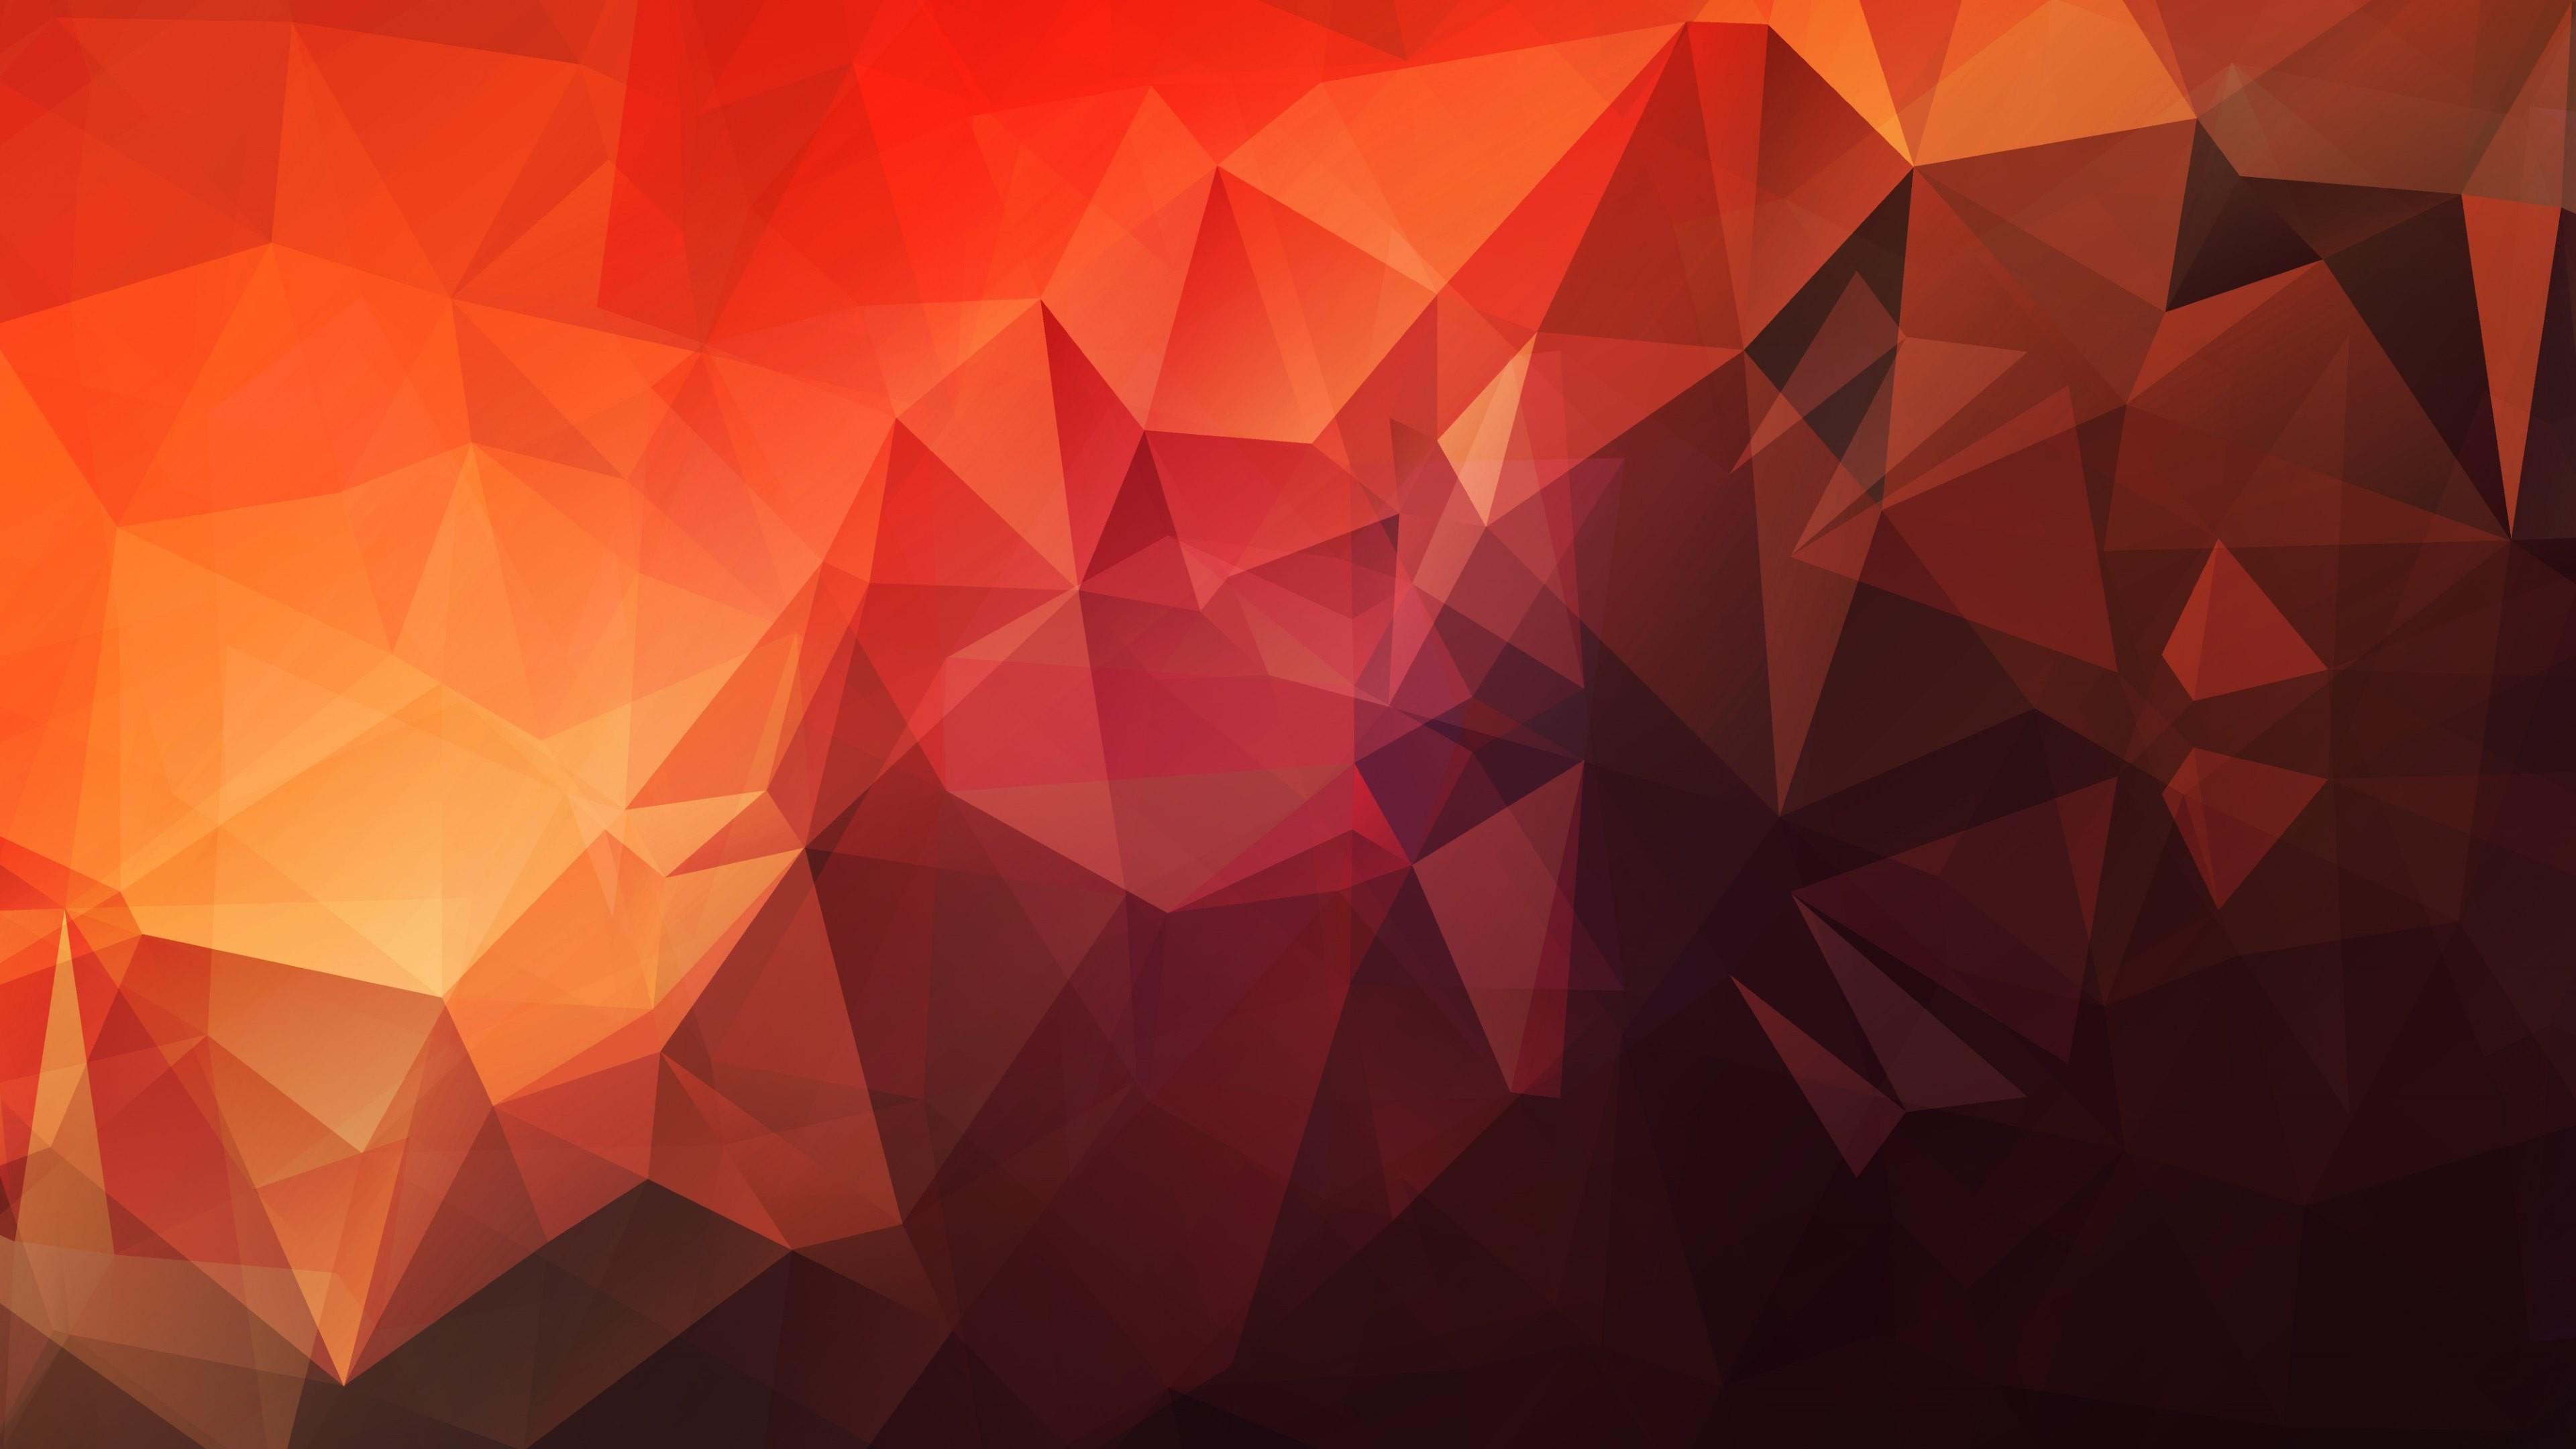 Wallpaper: Polygon. Ultra HD 4K 3840×2160